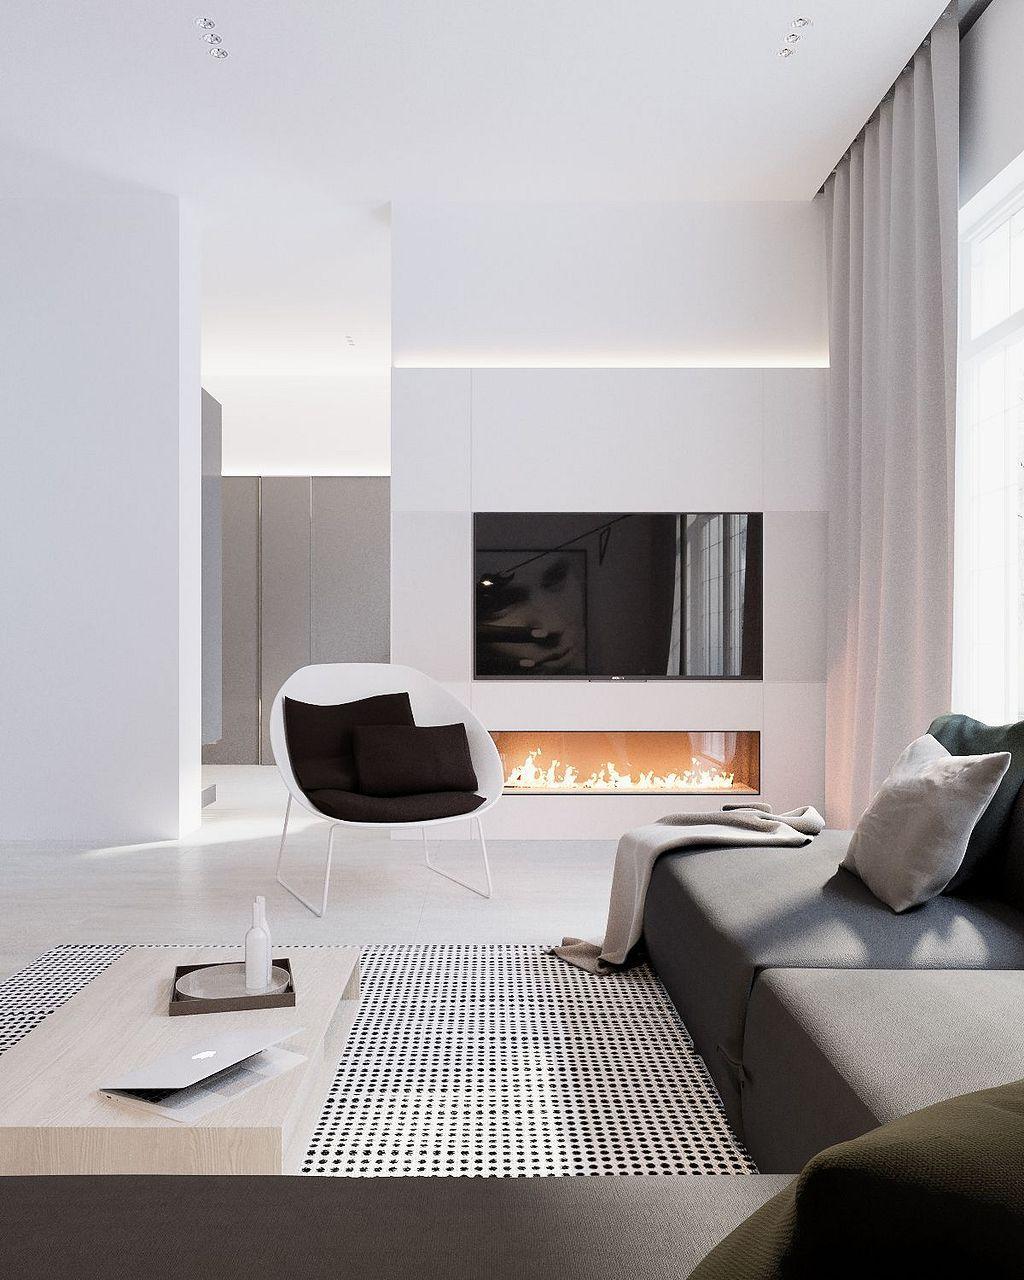 47 Modern Home Interior Design Ideas